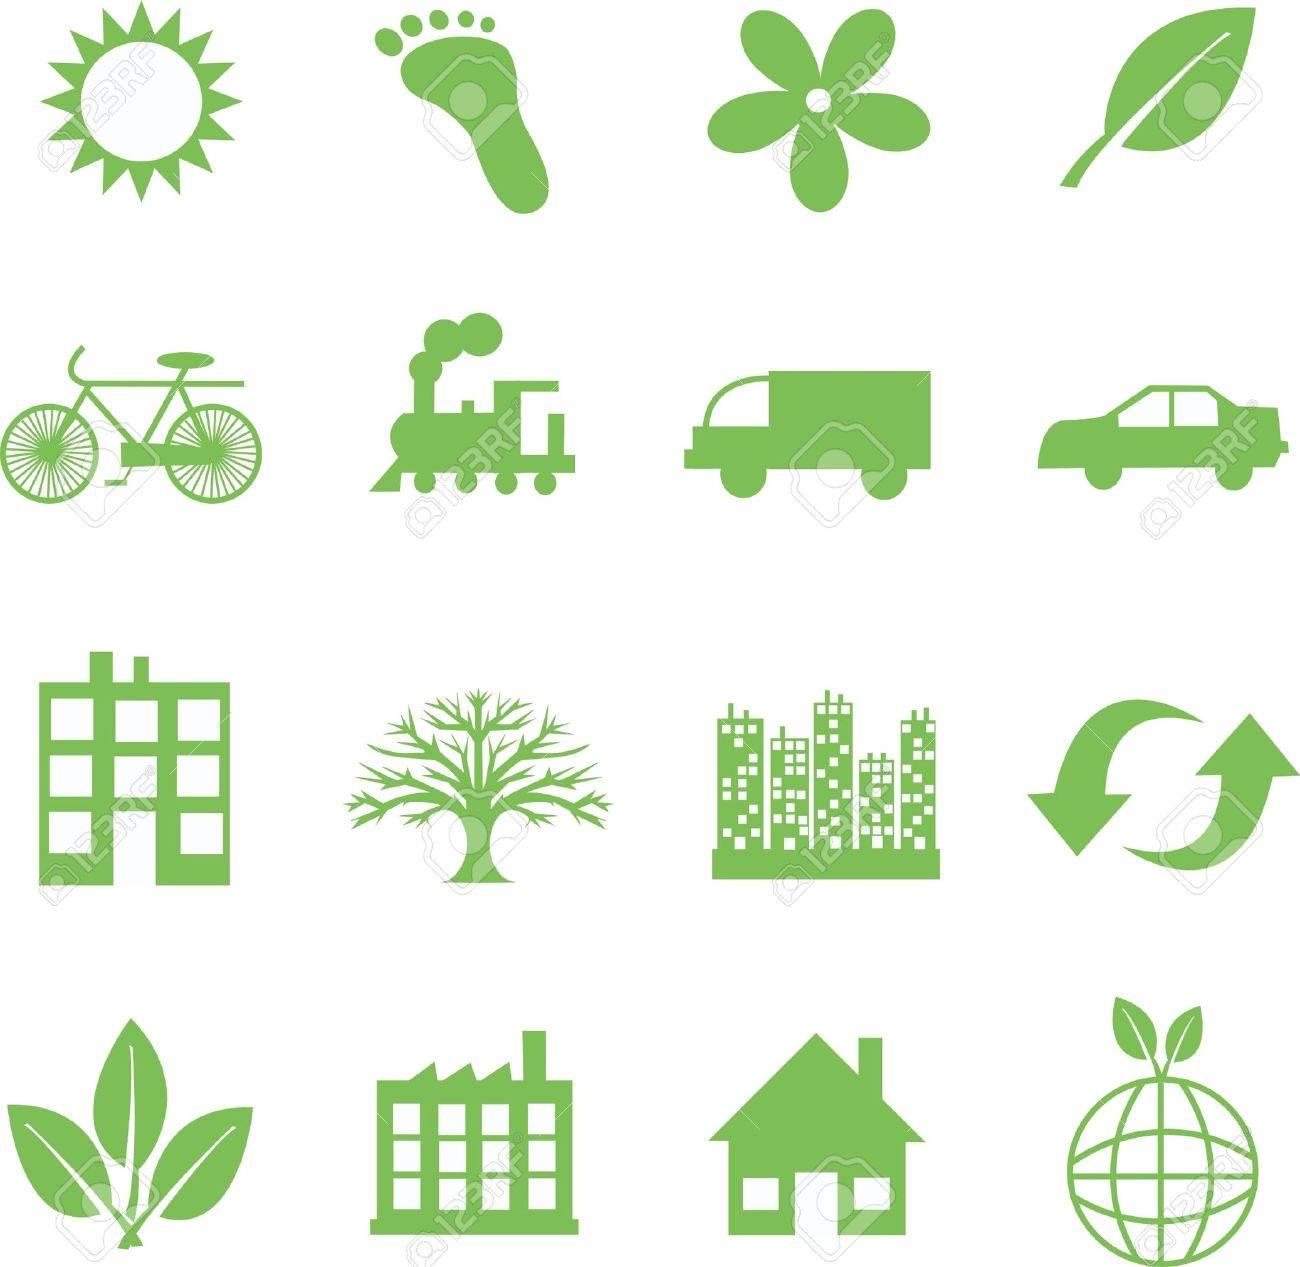 green ecology symbols Stock Vector - 8549241